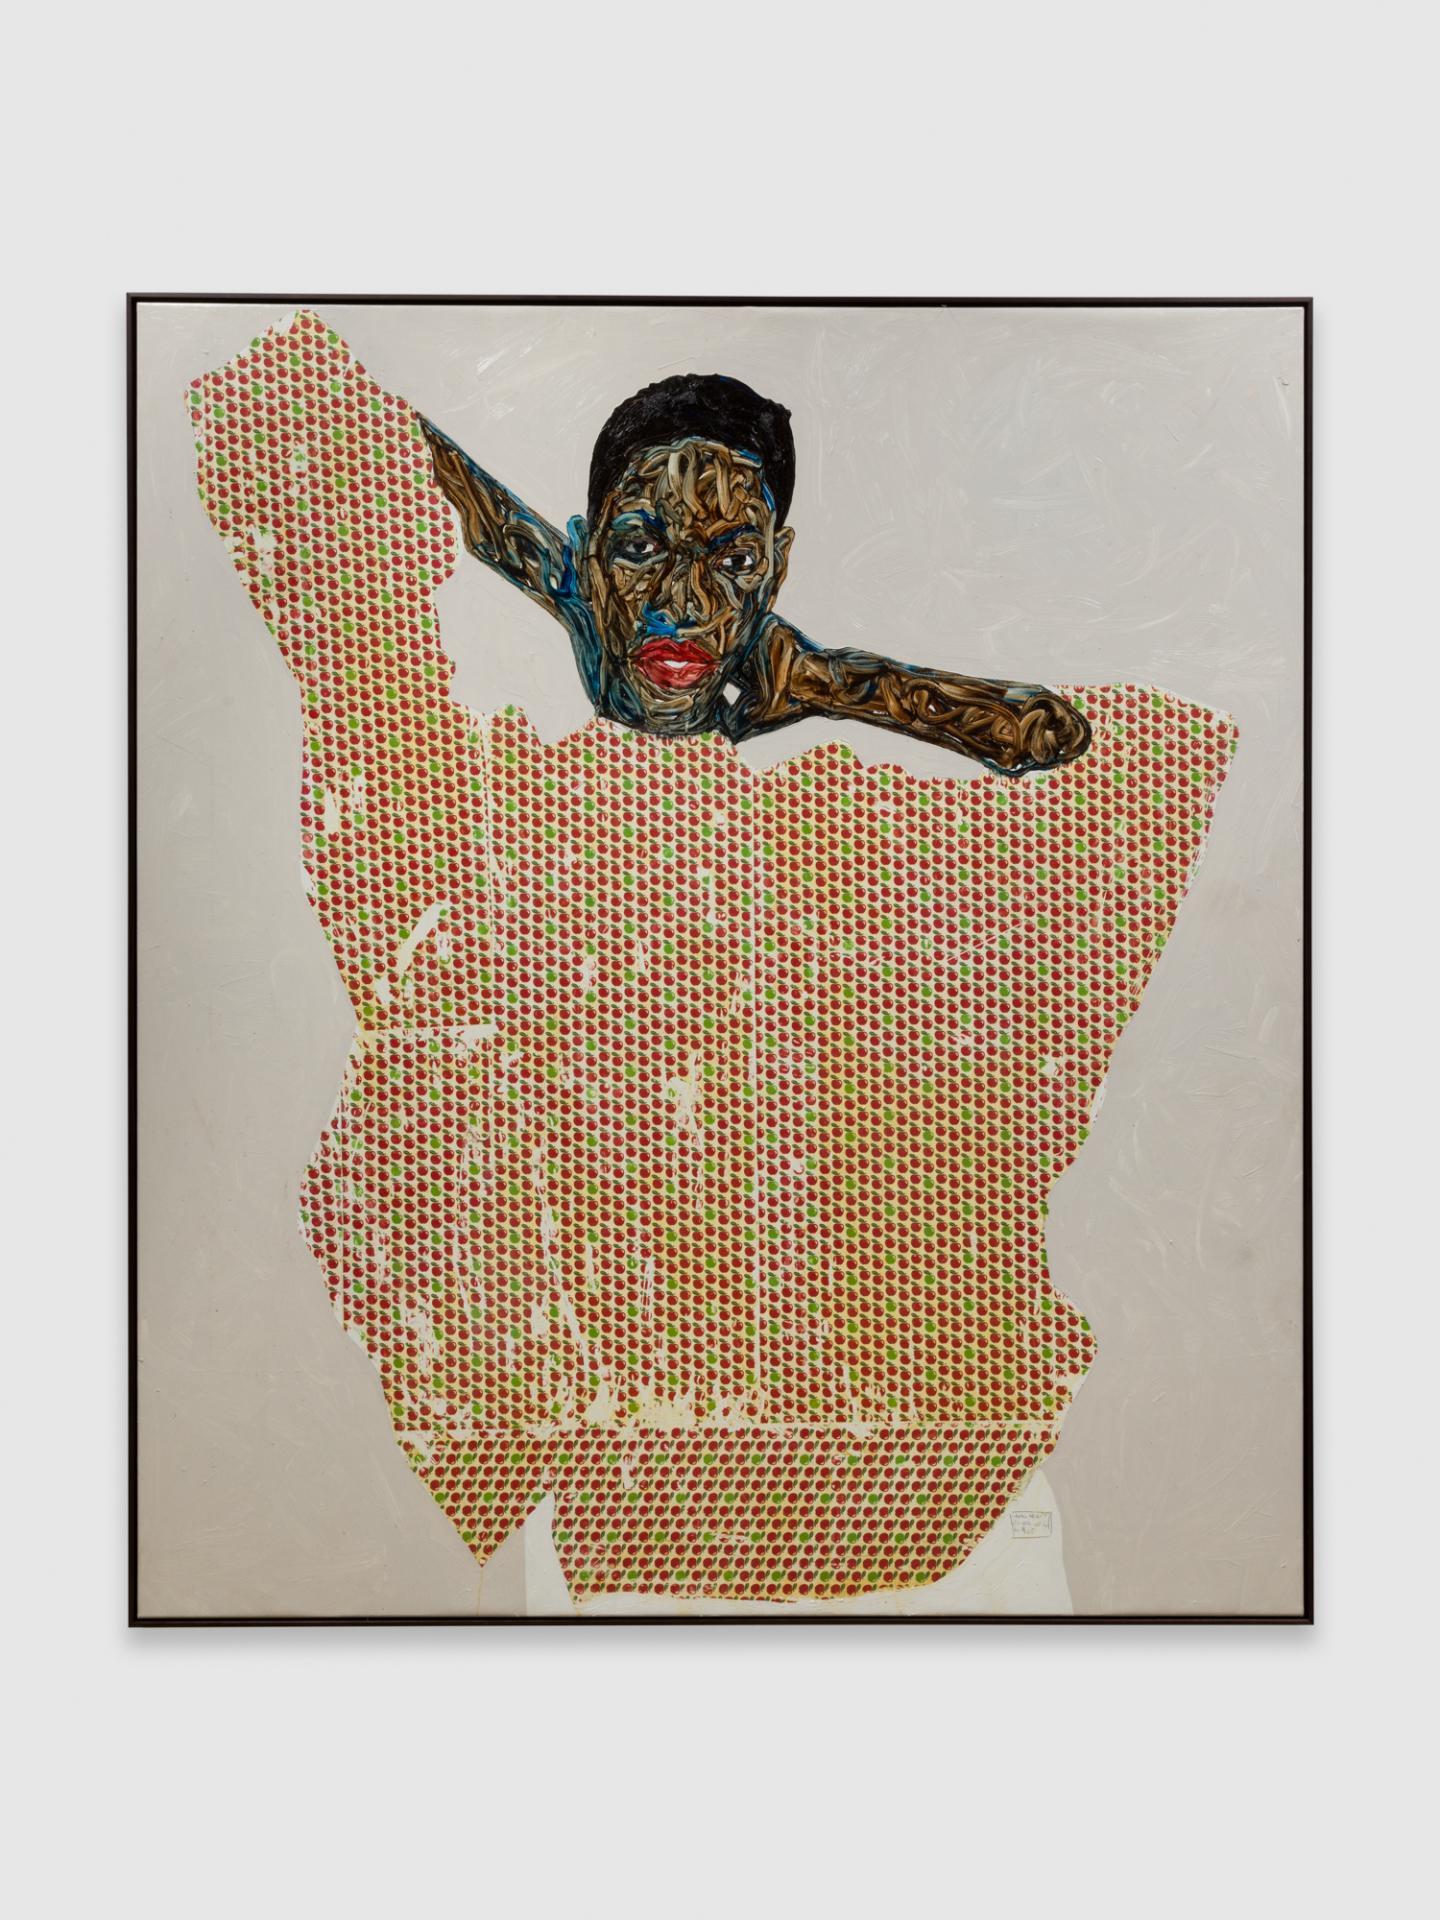 Amoako Boafo, Tasia Cobbinah, 2020, oil on canvas, 180 x 160 cm. Courtesy: the artist and Mariane Ibrahim.